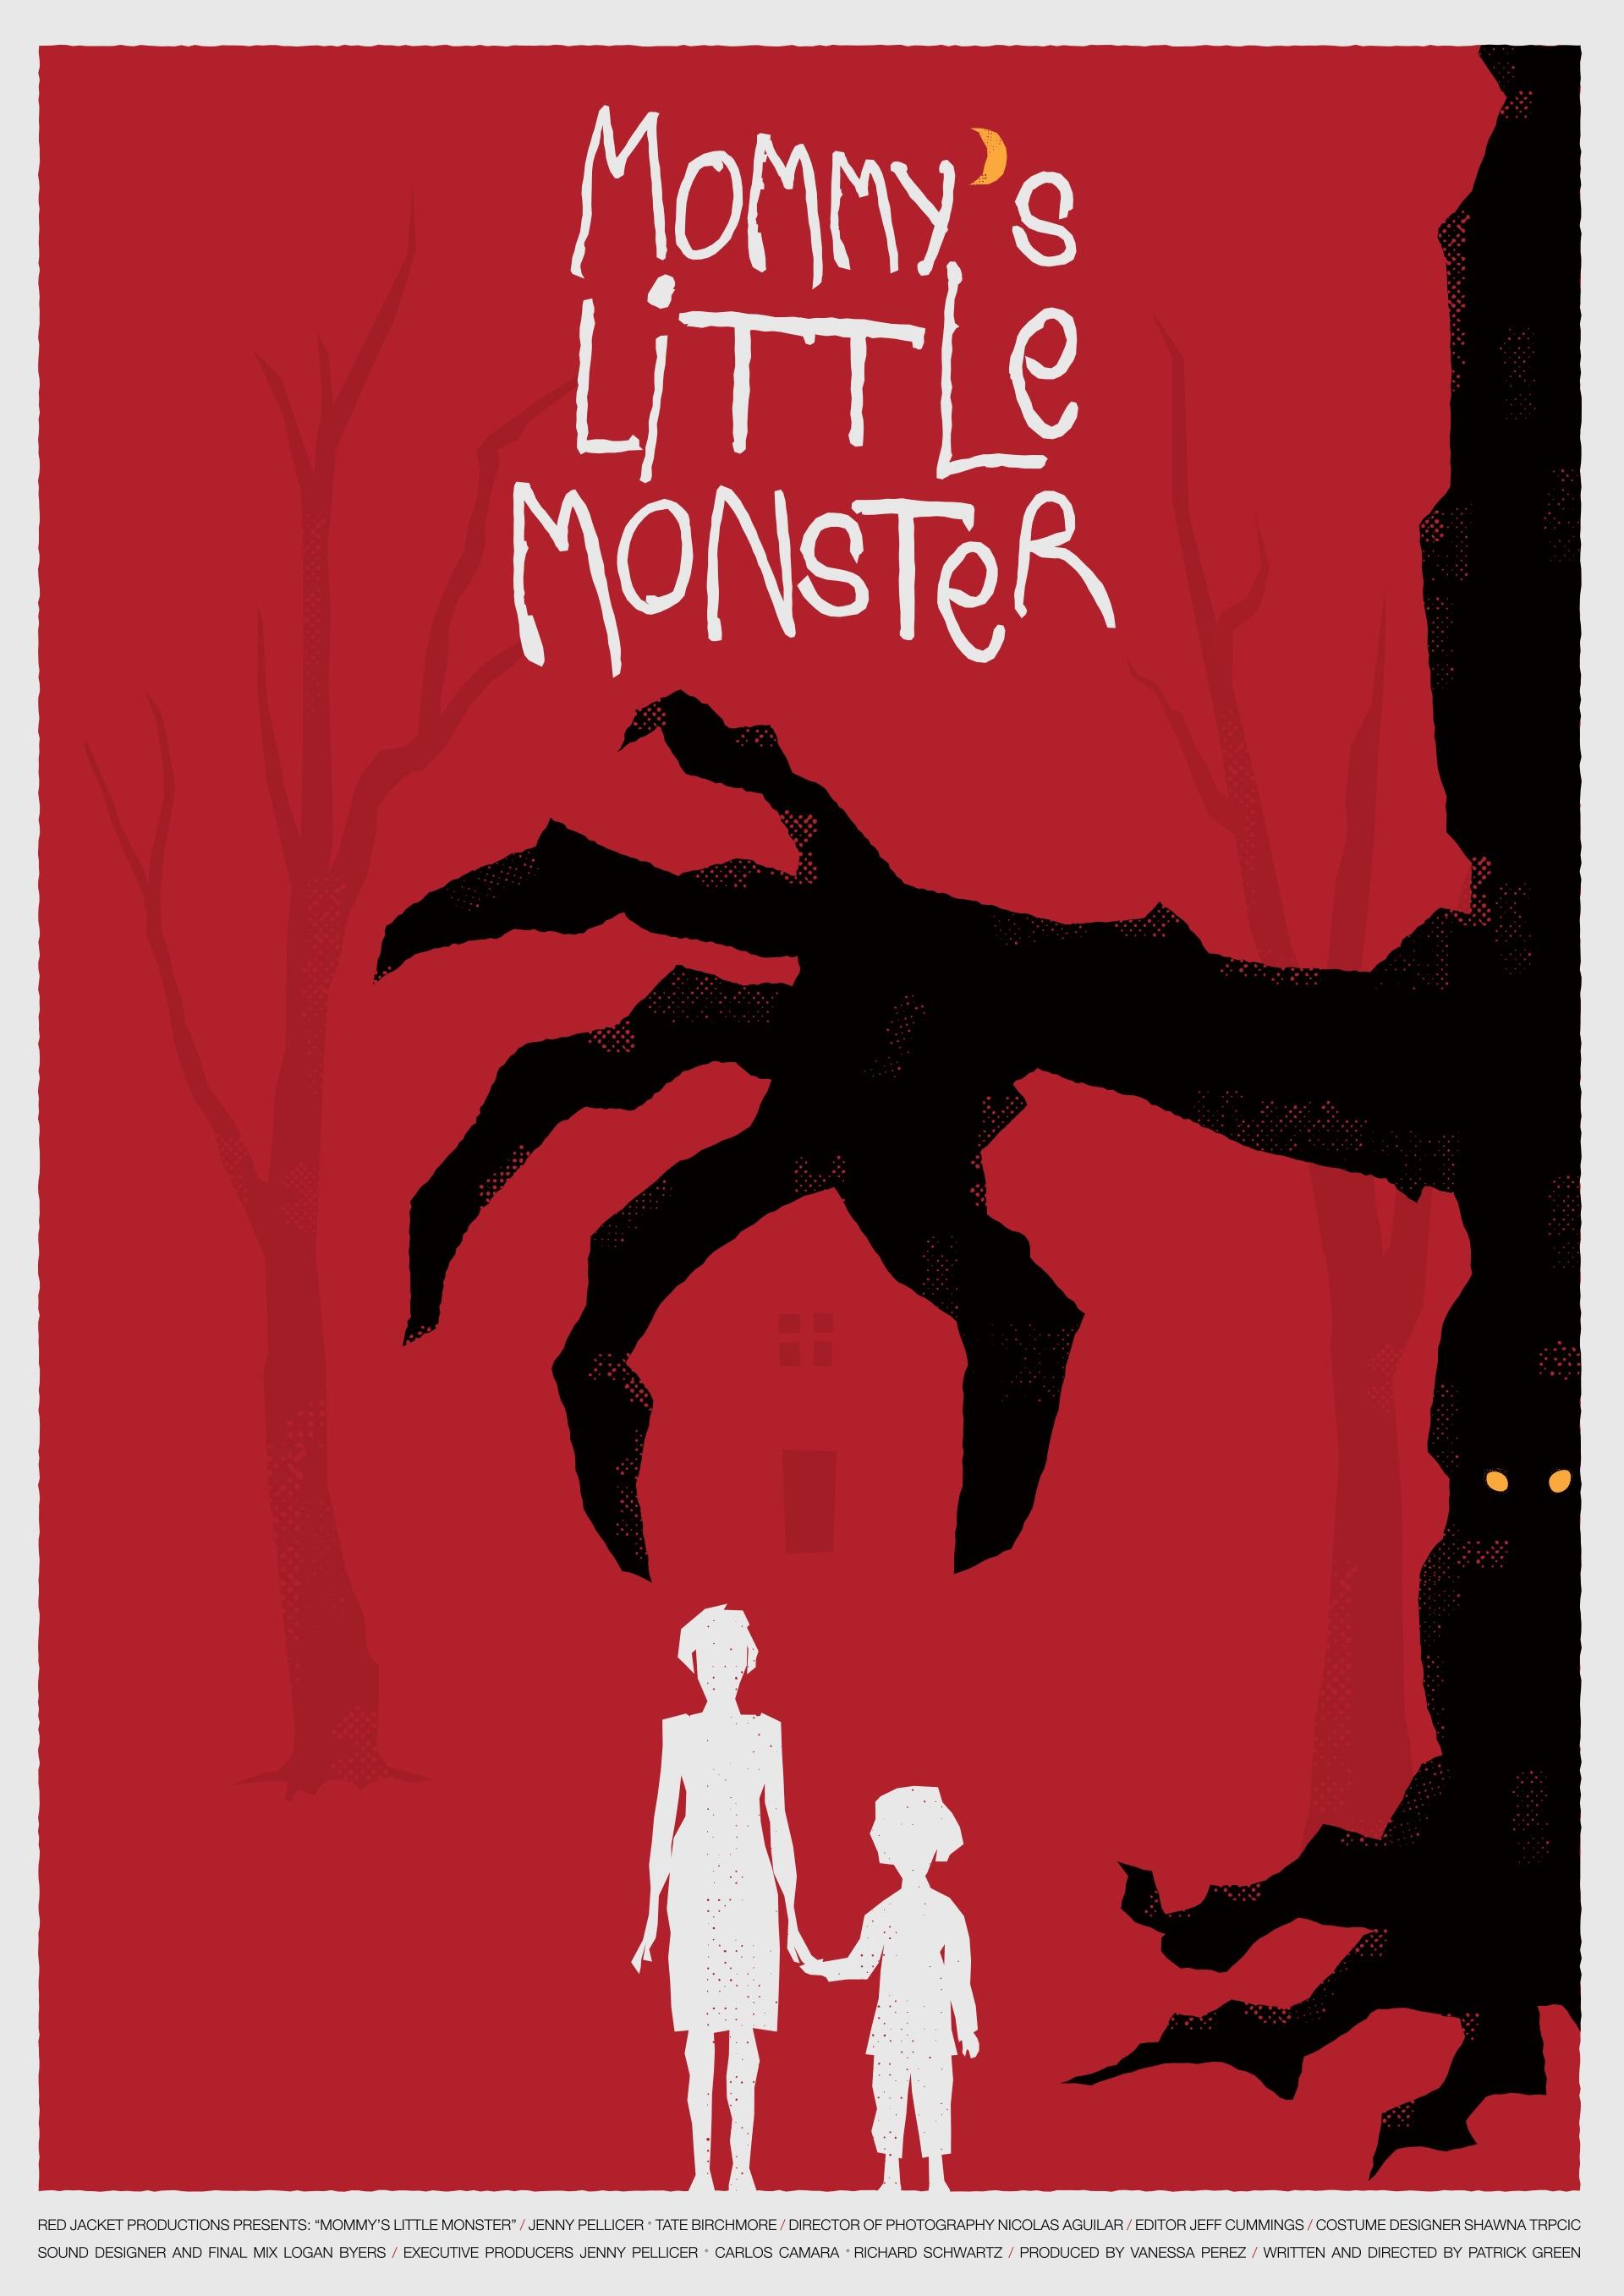 Patrick Geen, Mommy's Little Monster